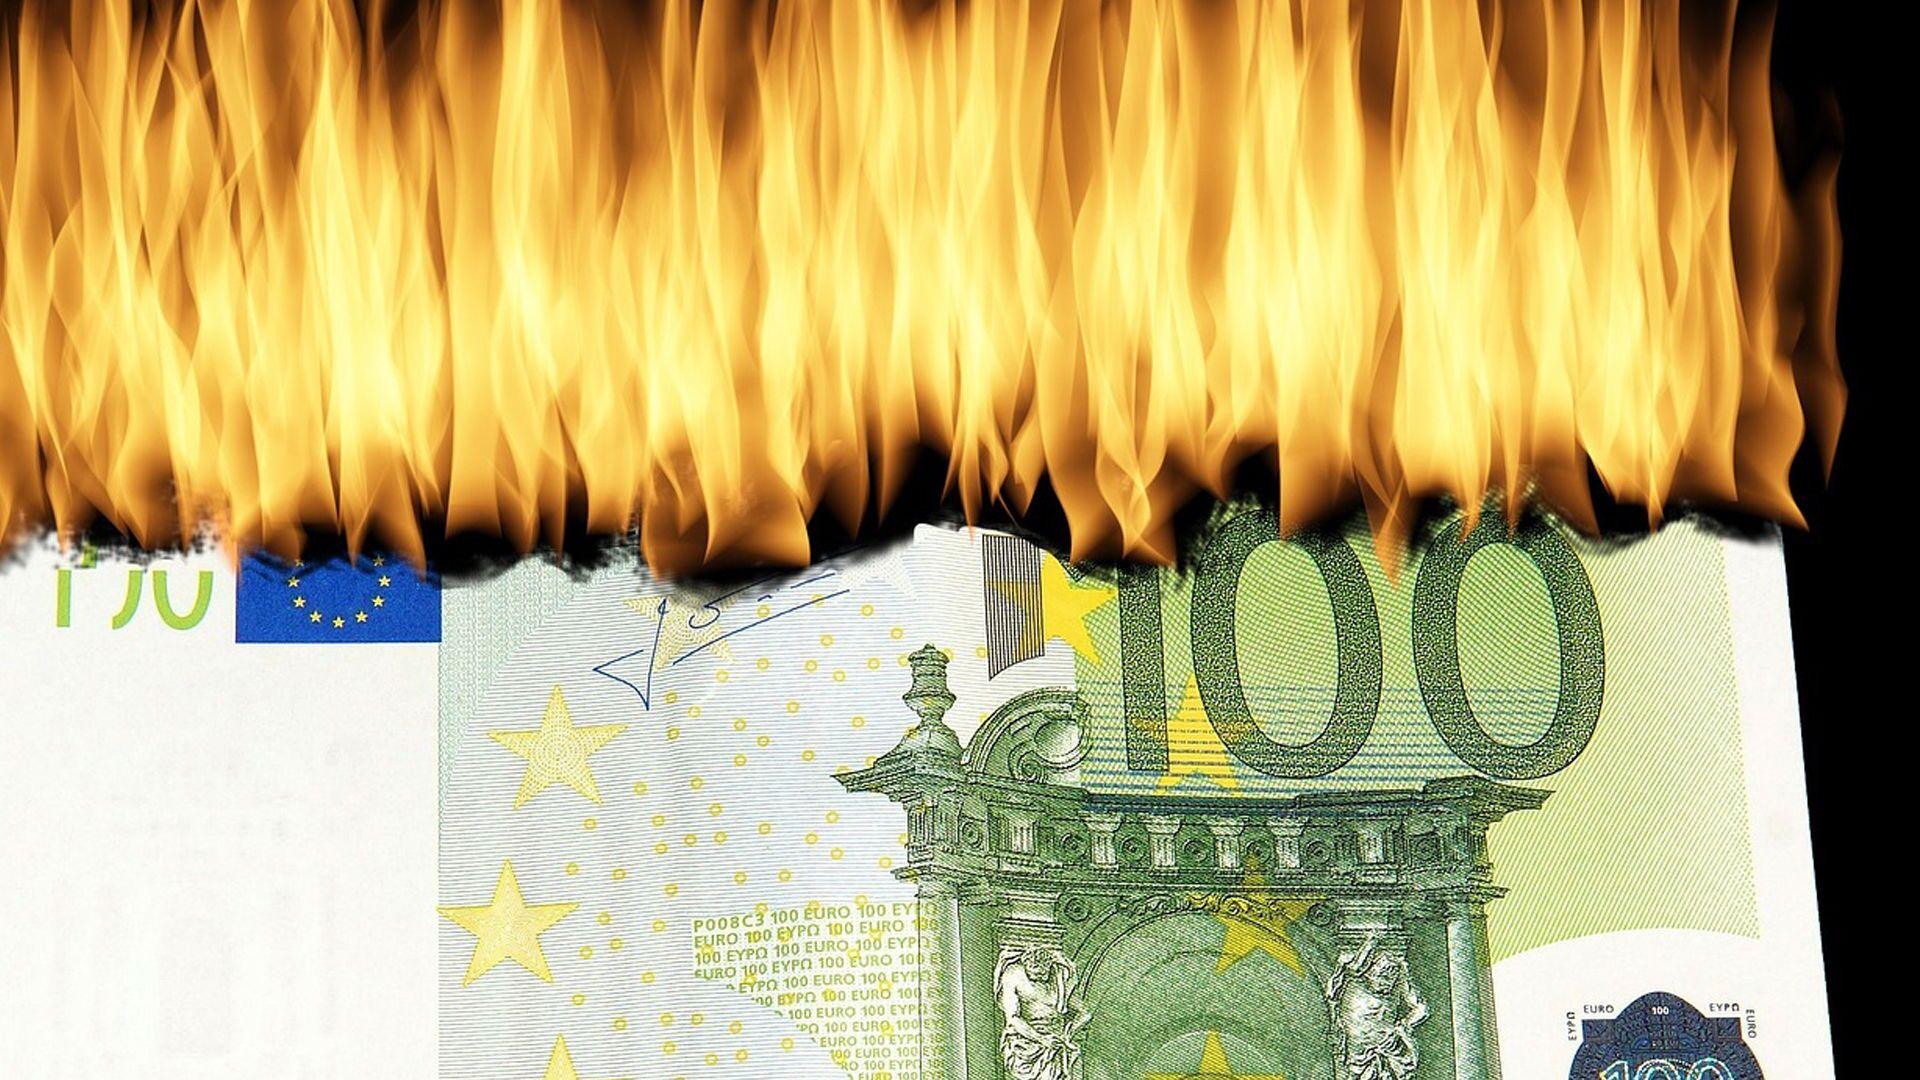 100 euro in fiamme - immagine metaforica - Sputnik Italia, 1920, 26.03.2021